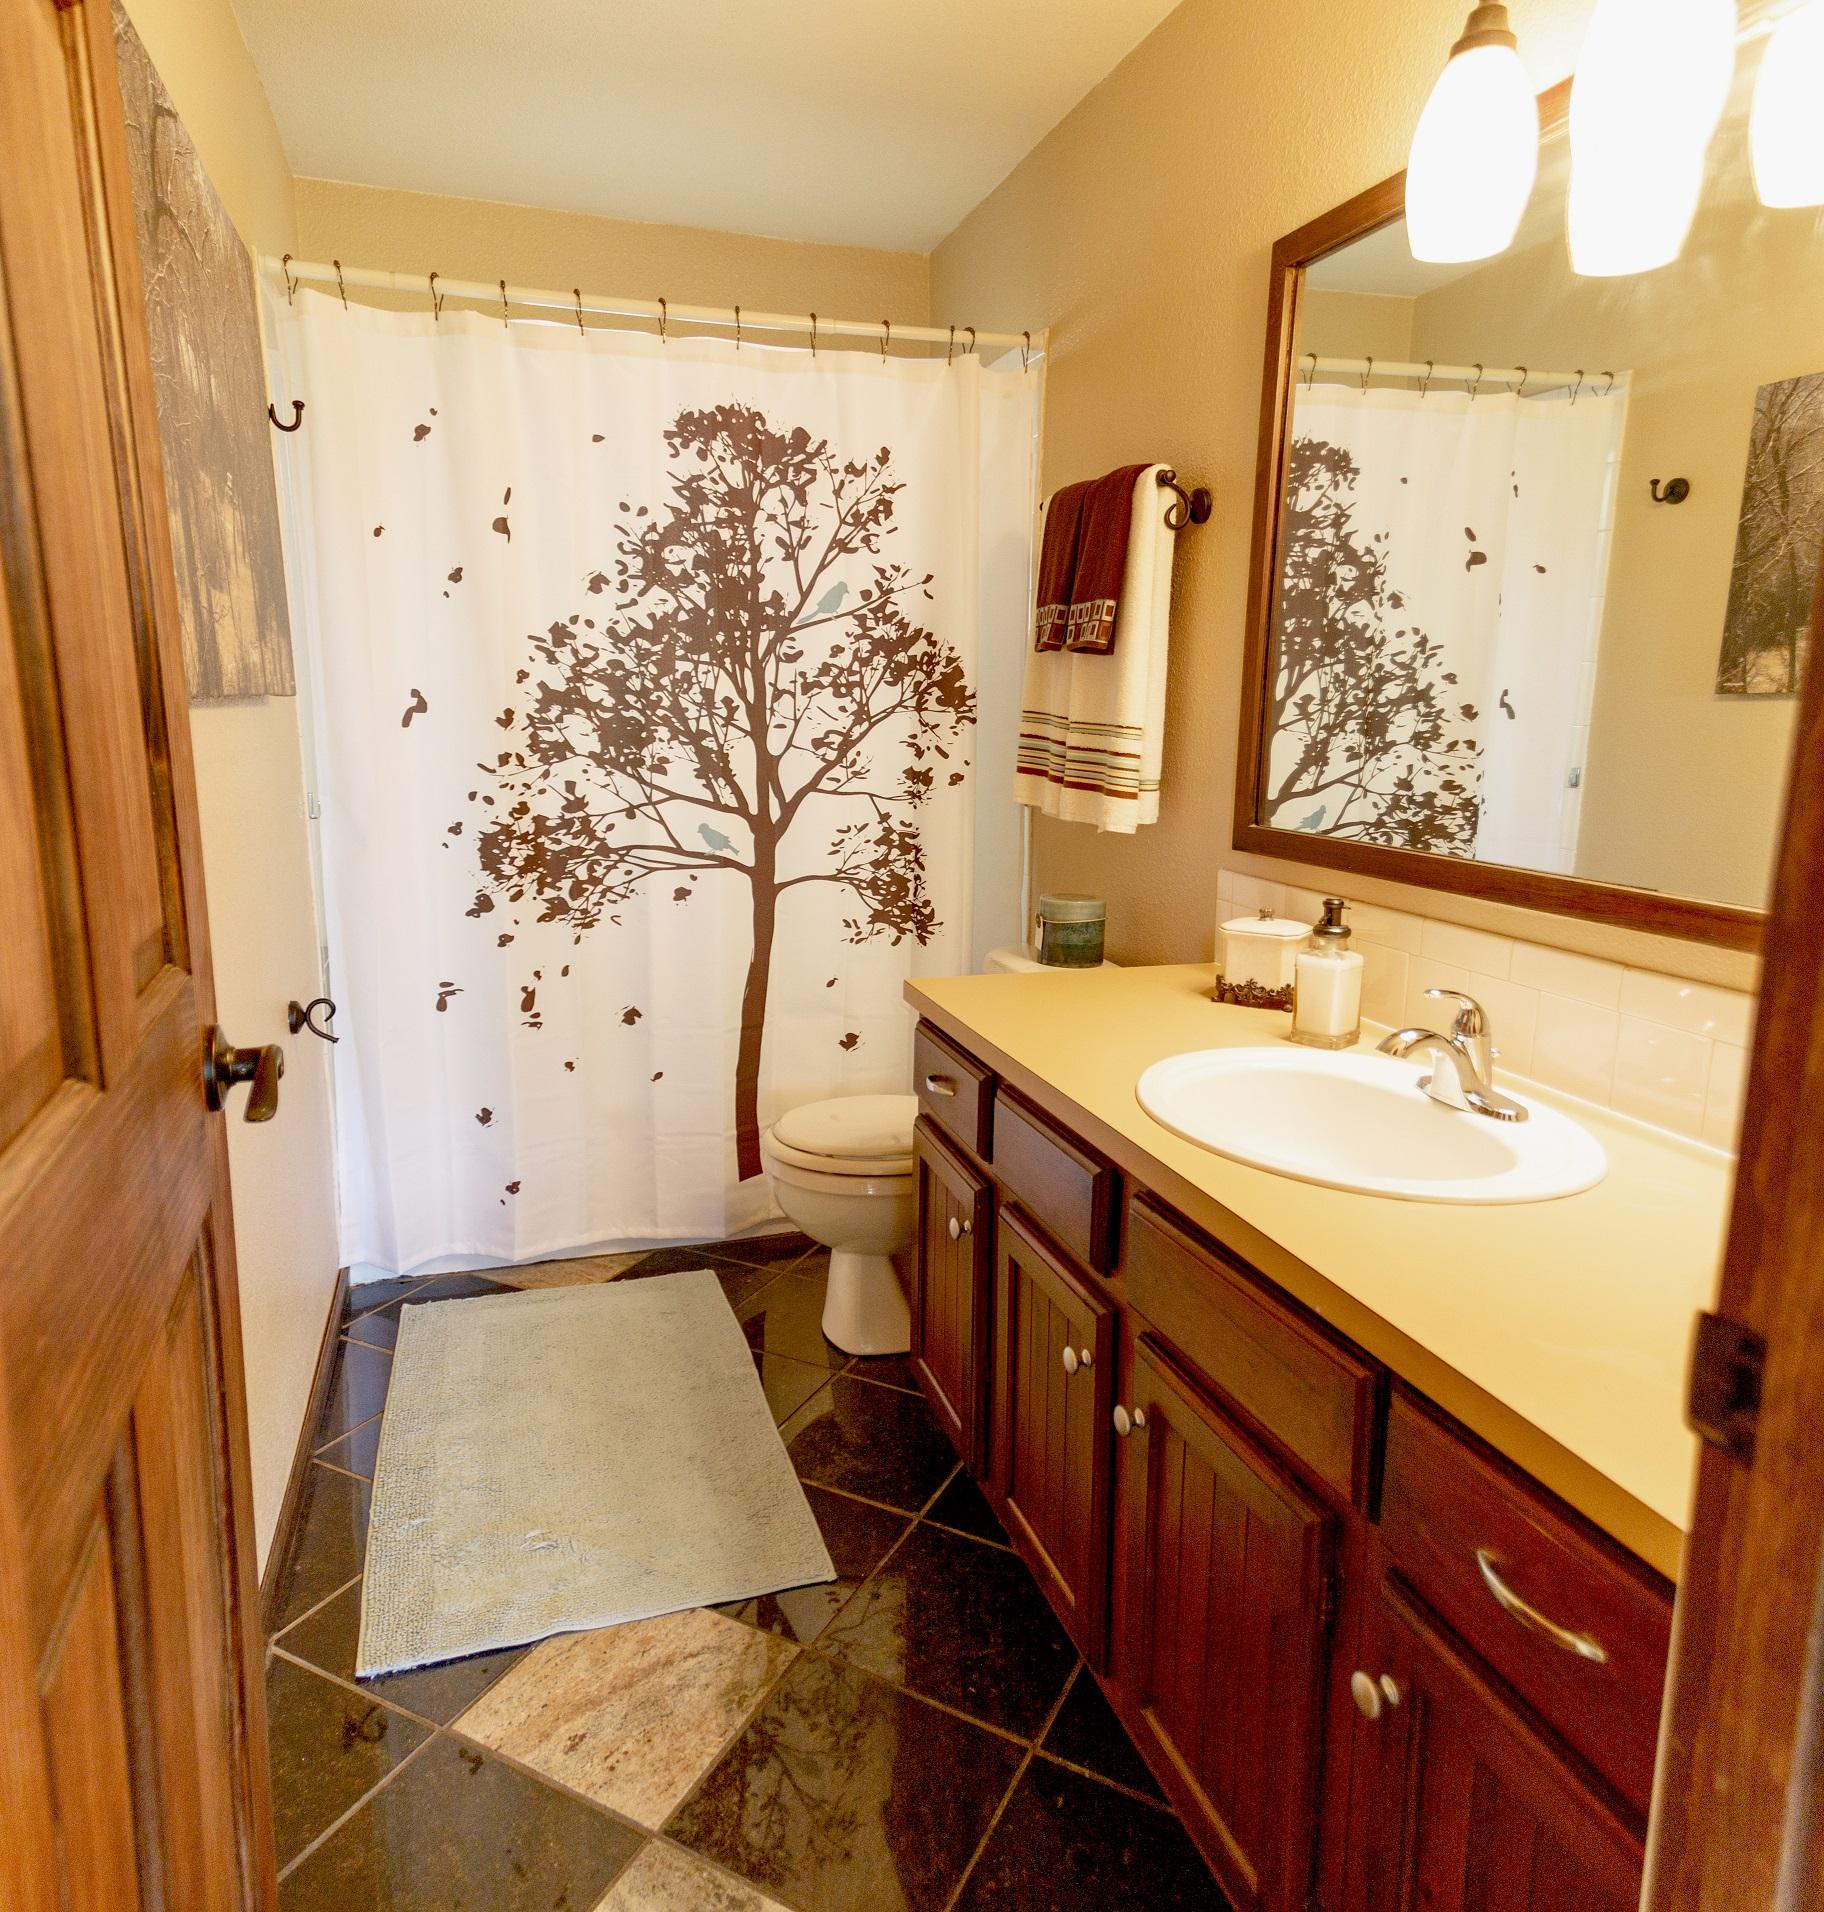 c2 Bathroom #3 small